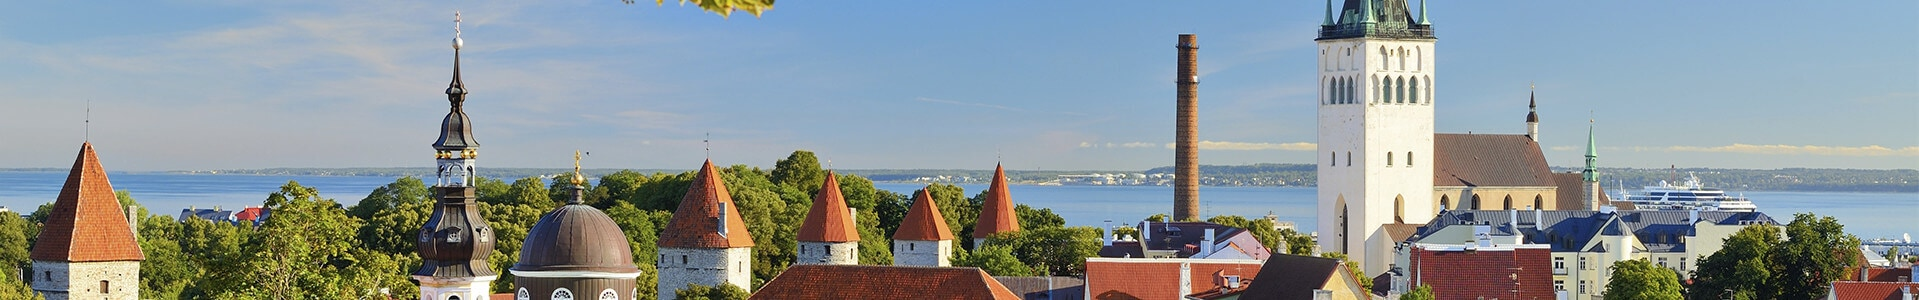 Voyage aux Pays Baltes - TUI